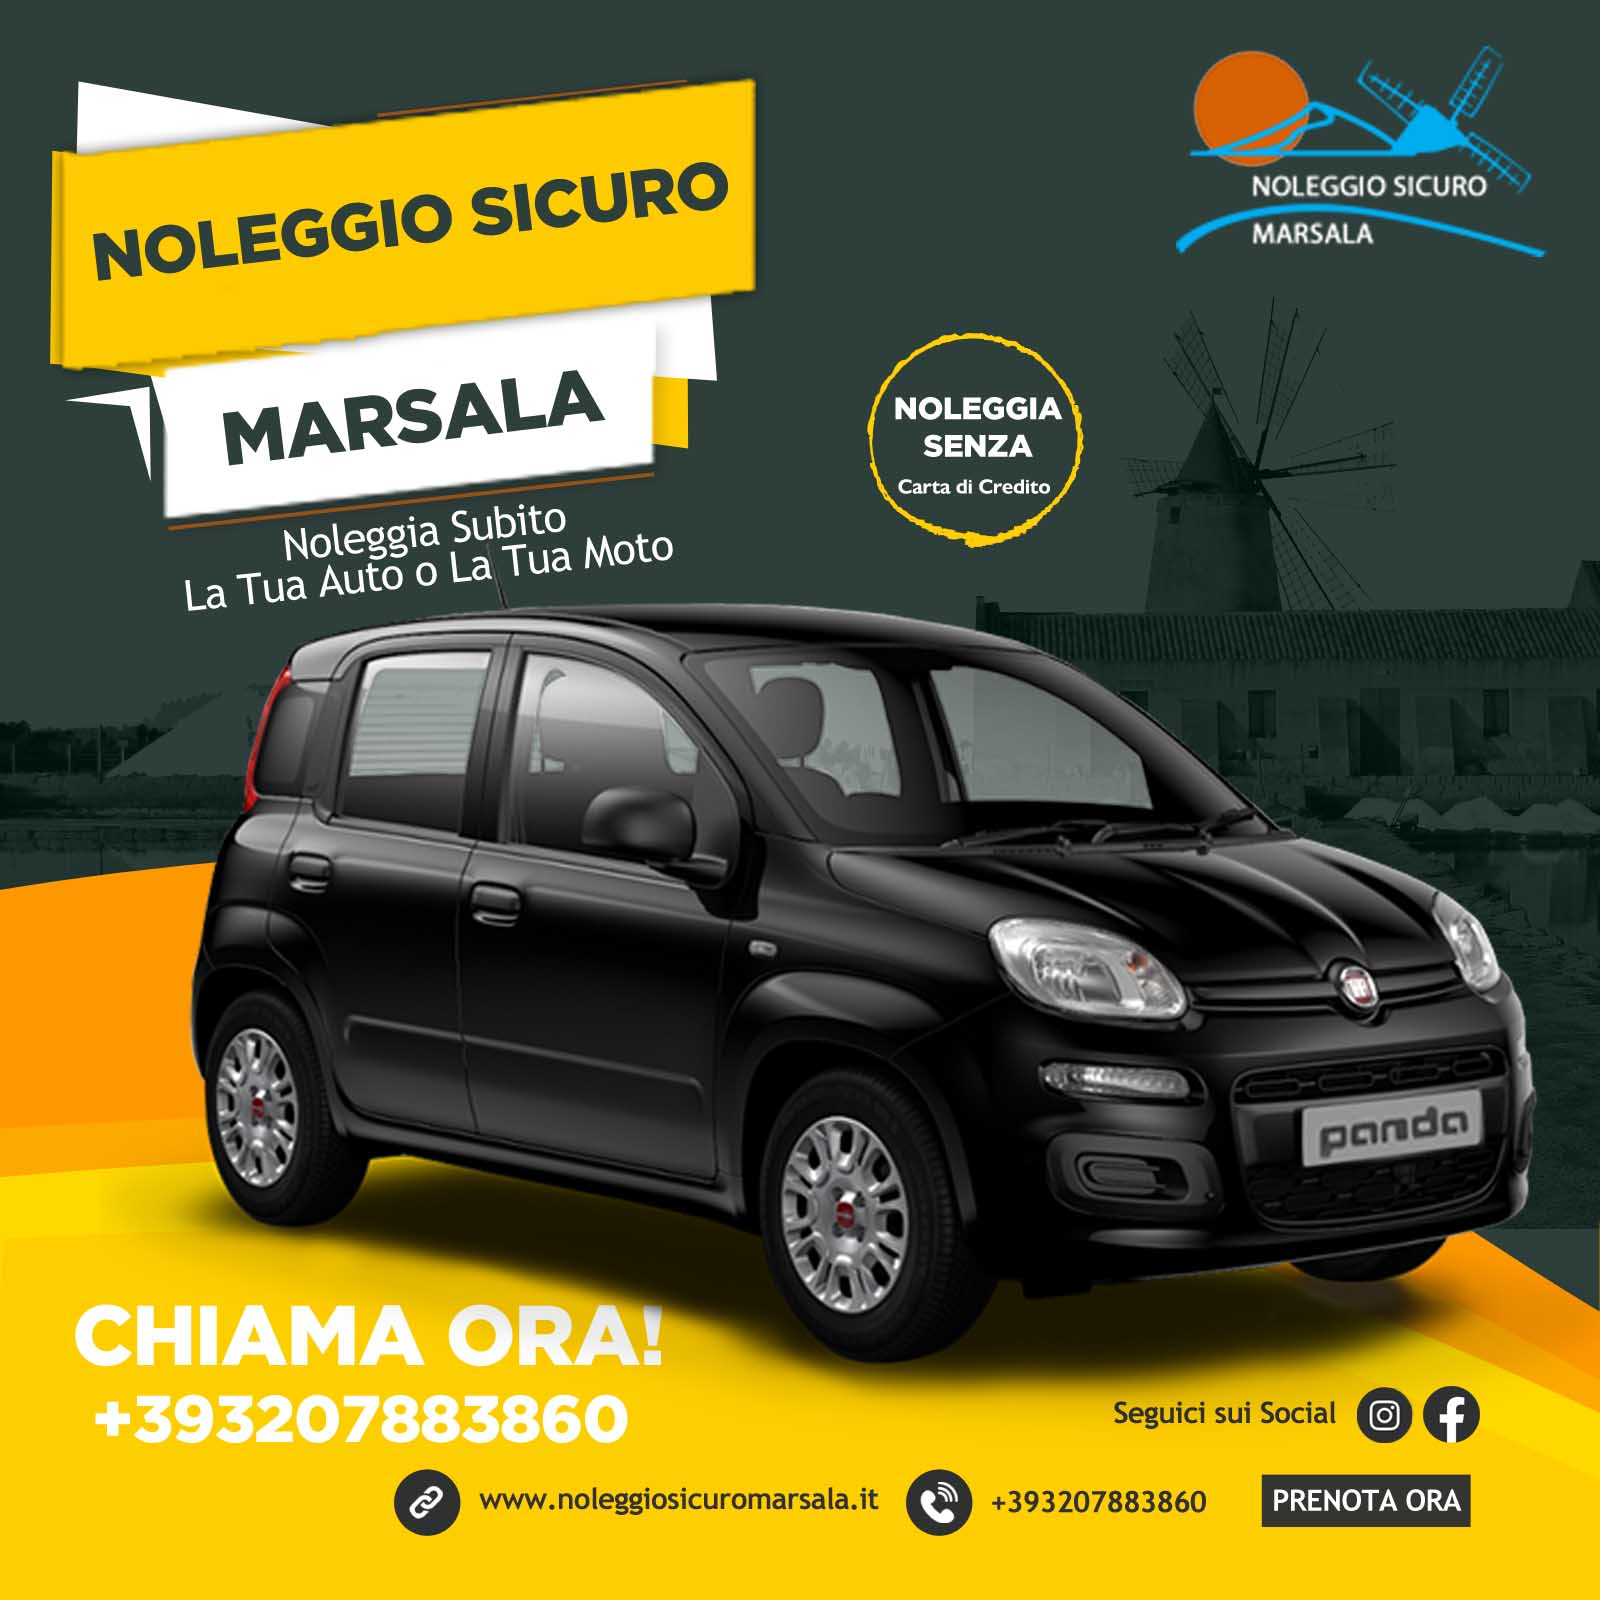 Noleggio Sicuro Marsala Rent Car Marsala Kite club Marsala IT